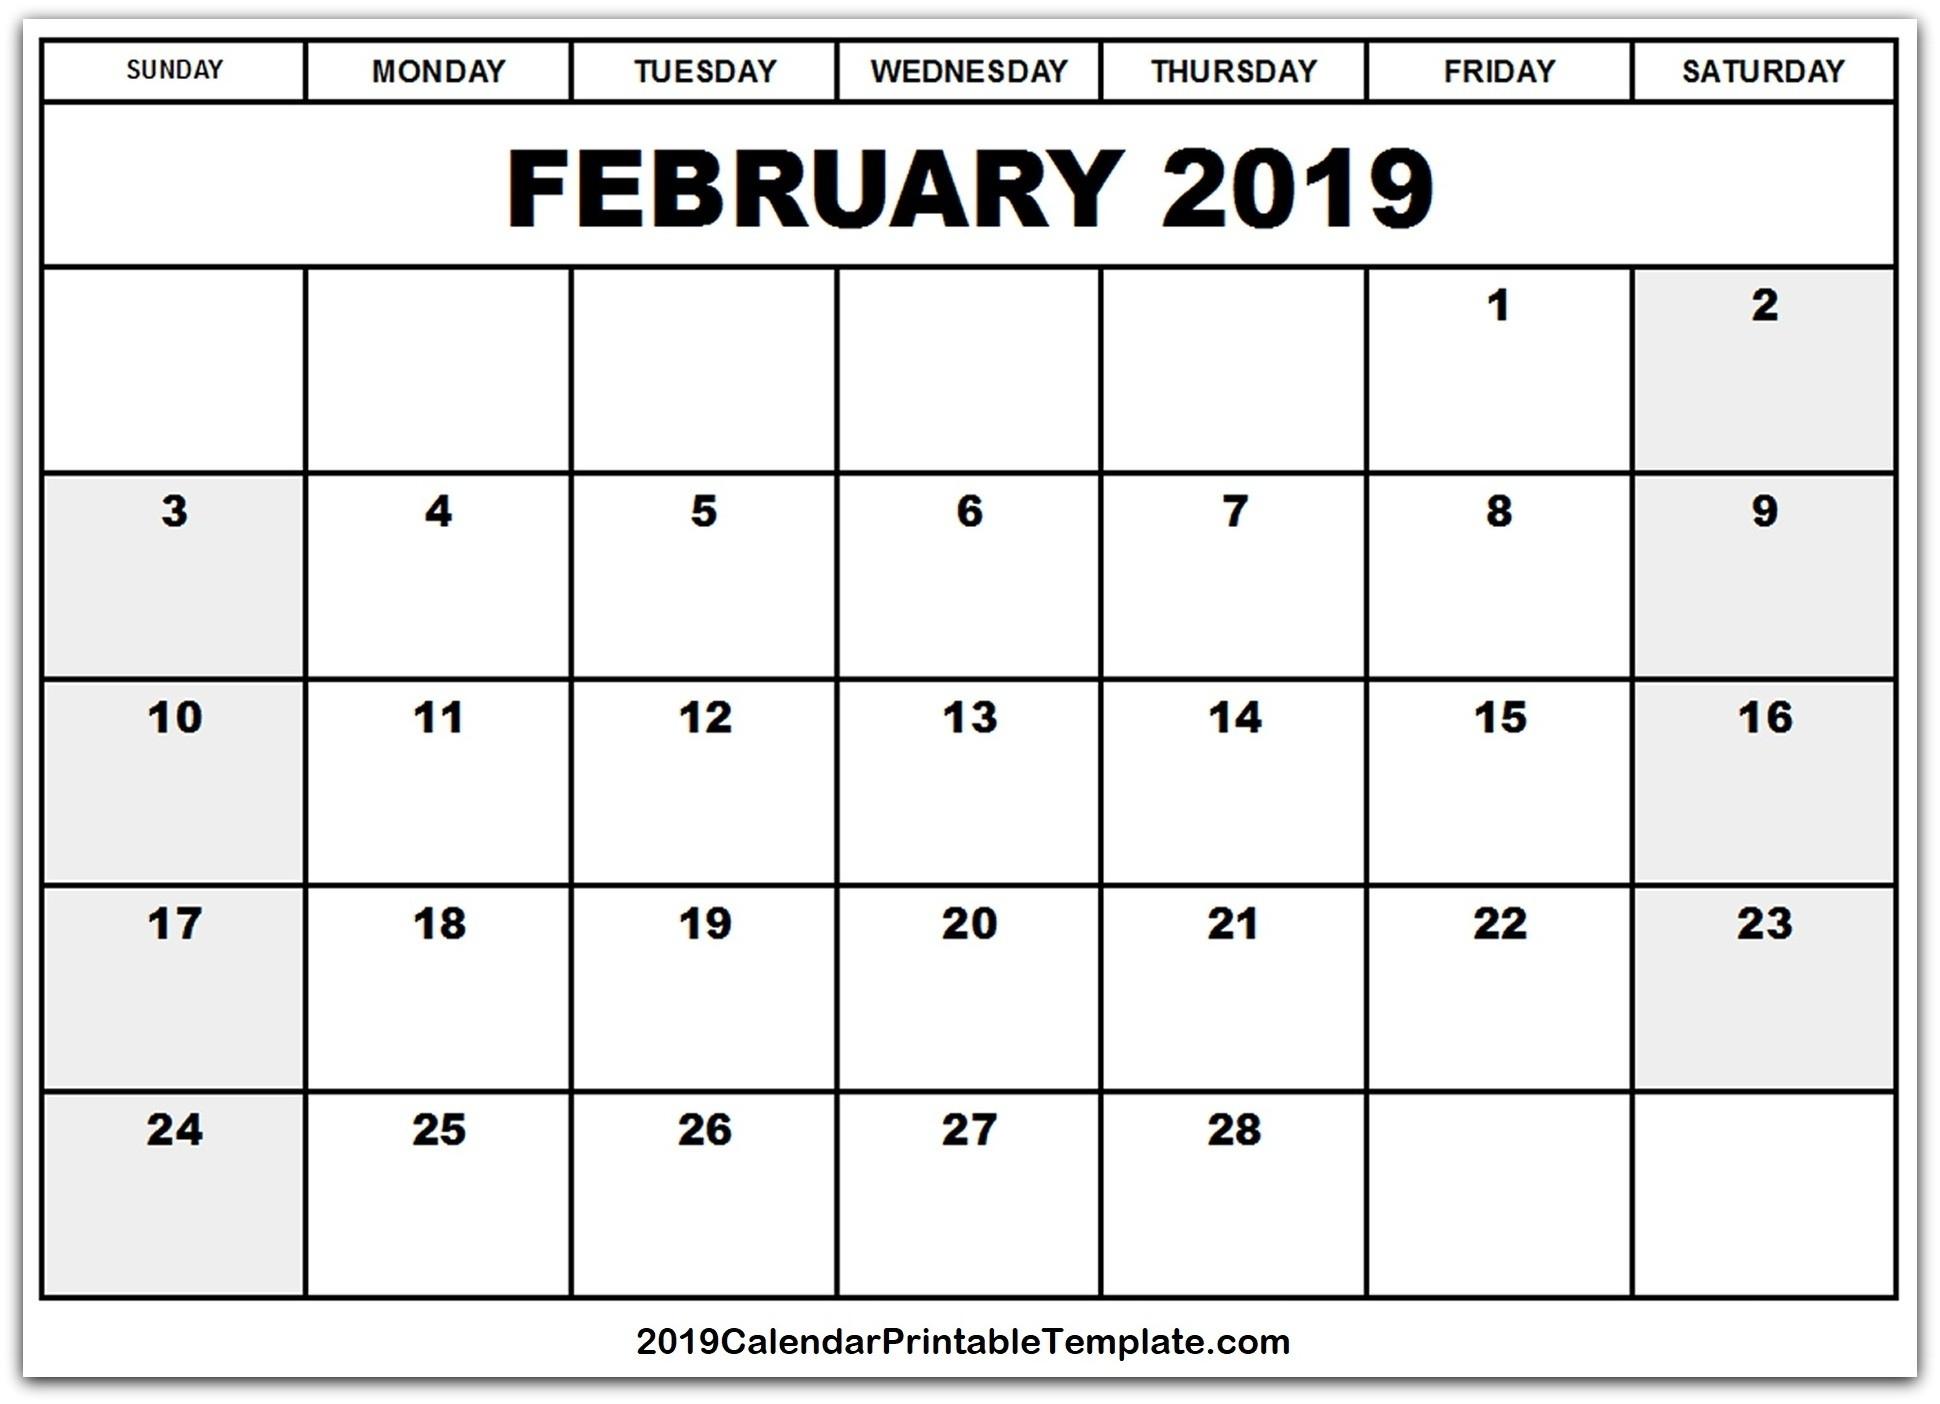 February 2019 Calendar Leap Year | Calendar Template